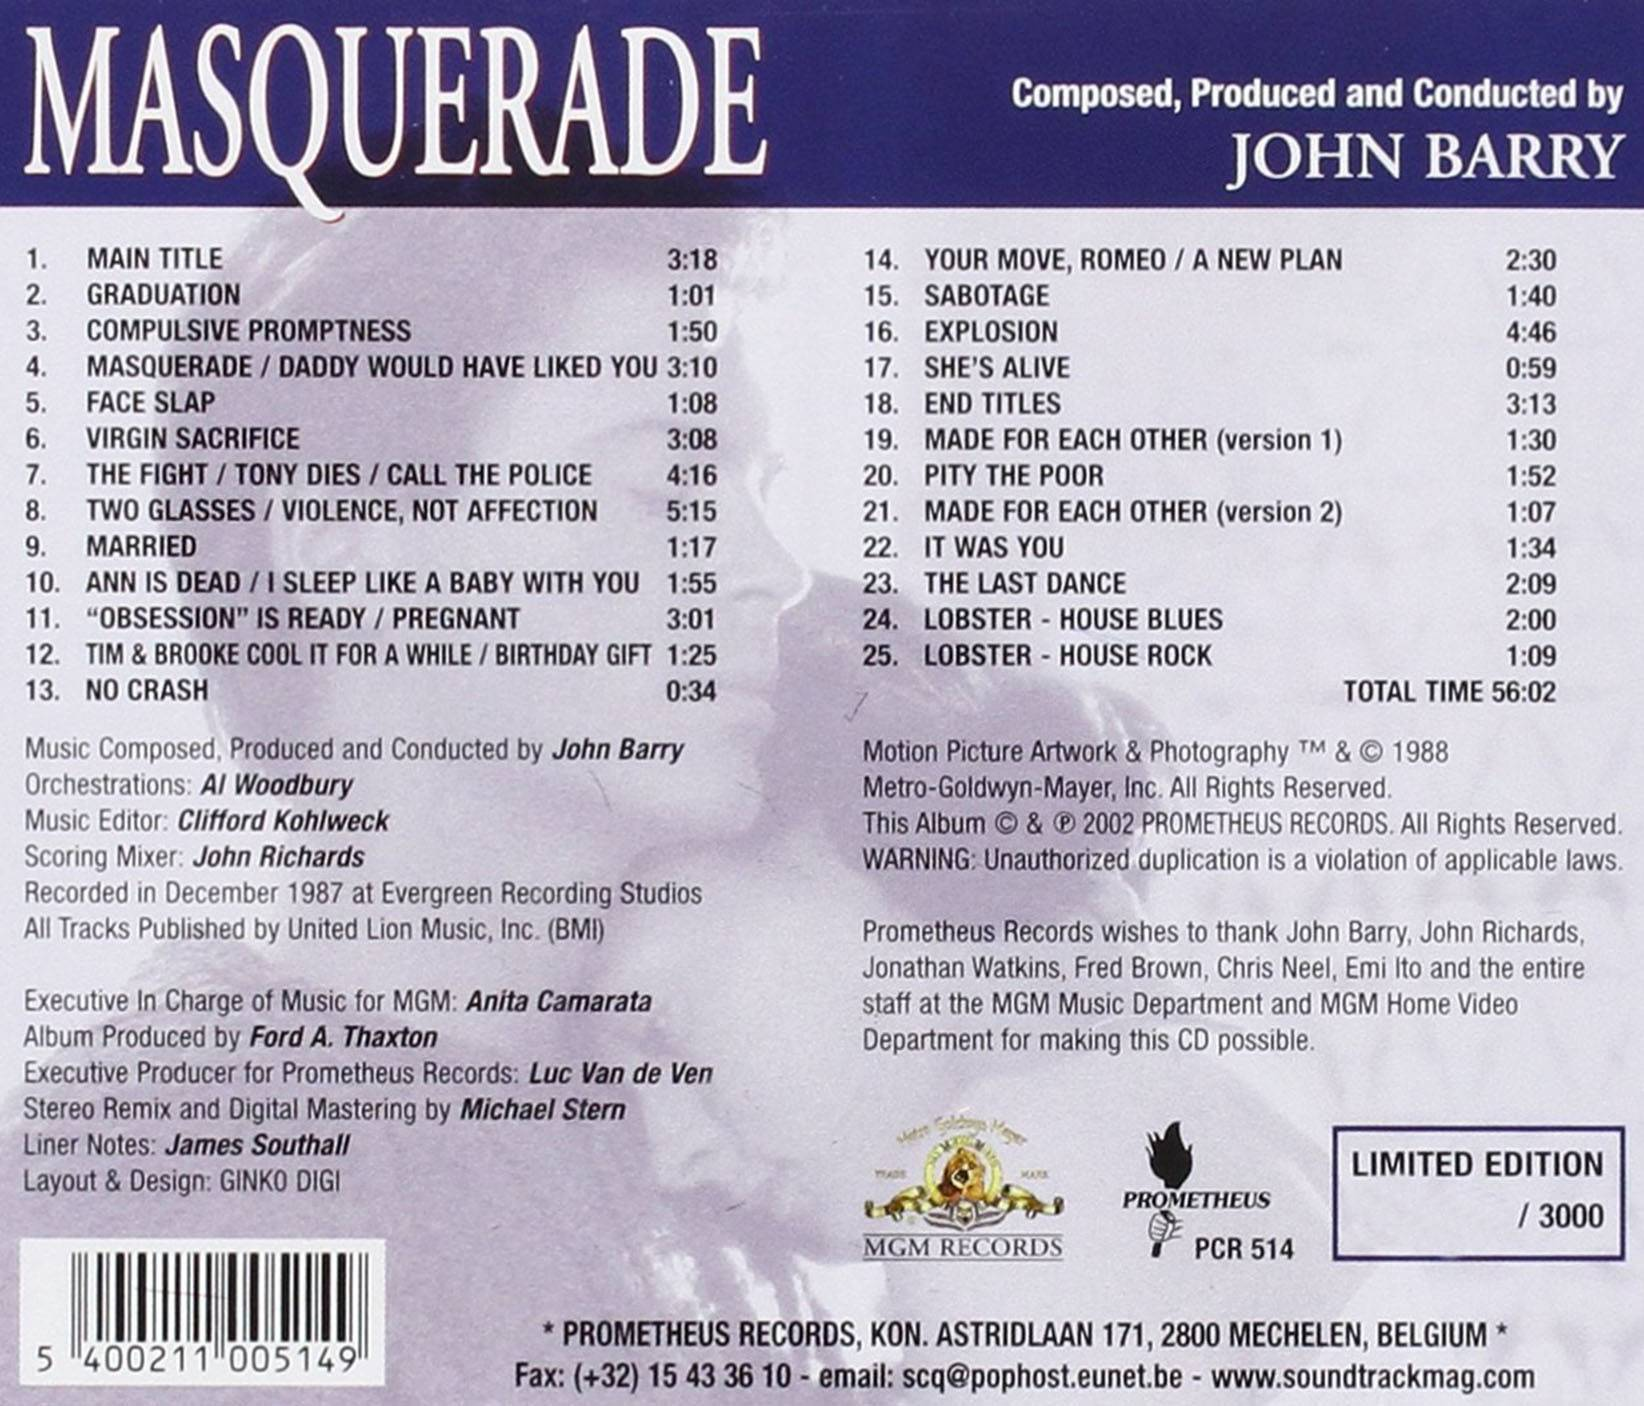 John Barry - Masquerade: Original MGM Motion Picture Soundtrack